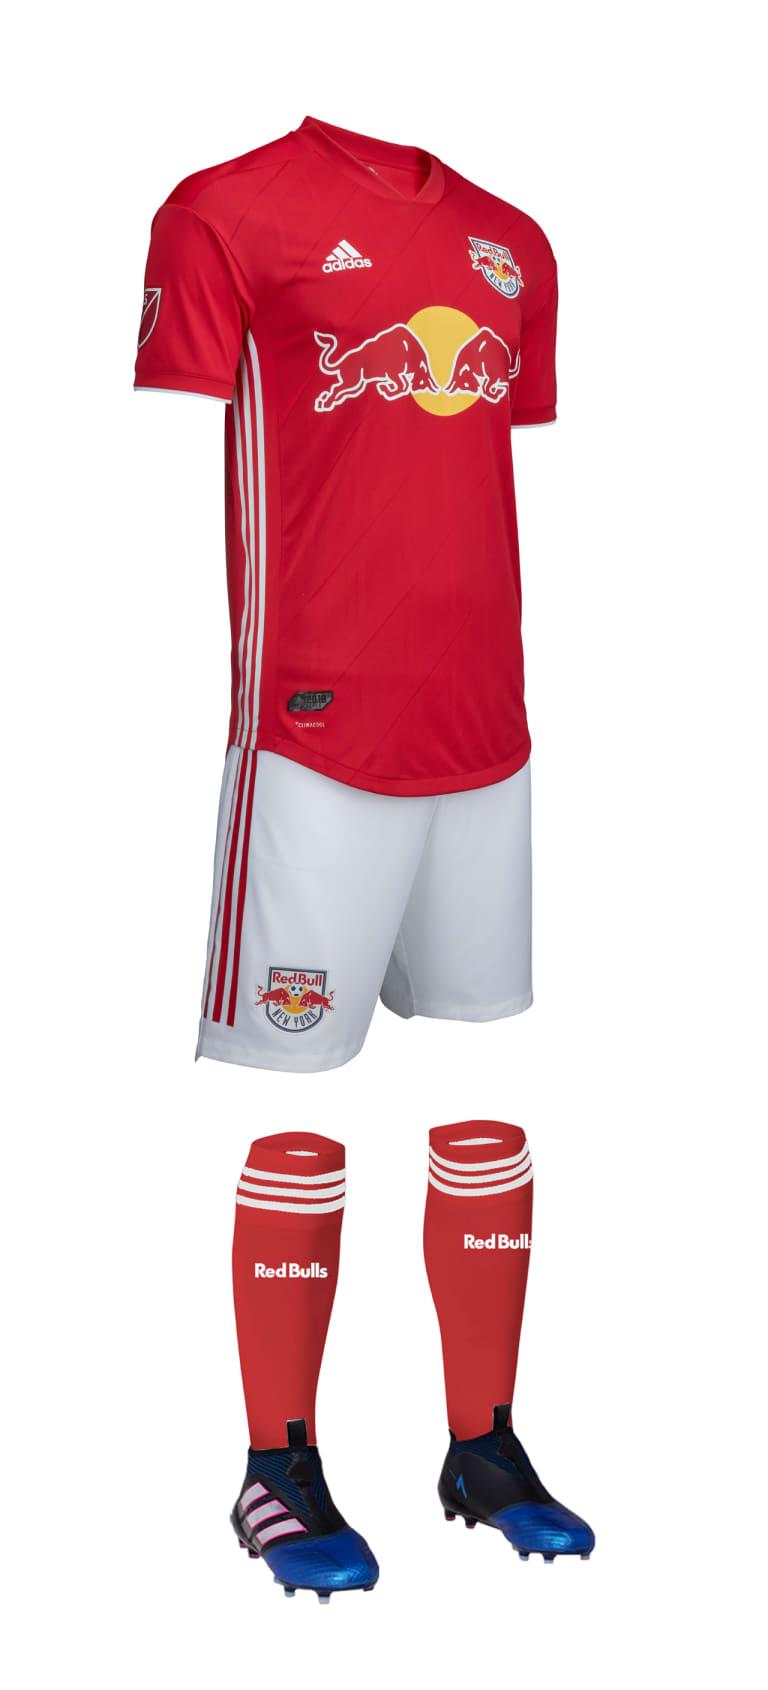 New York Red Bulls unveil all-red secondary jersey for 2018 - https://league-mp7static.mlsdigital.net/images/Adidas_MLS_2018_GhostBody_RedBullNewYork_KIT_Secondary-web.jpg